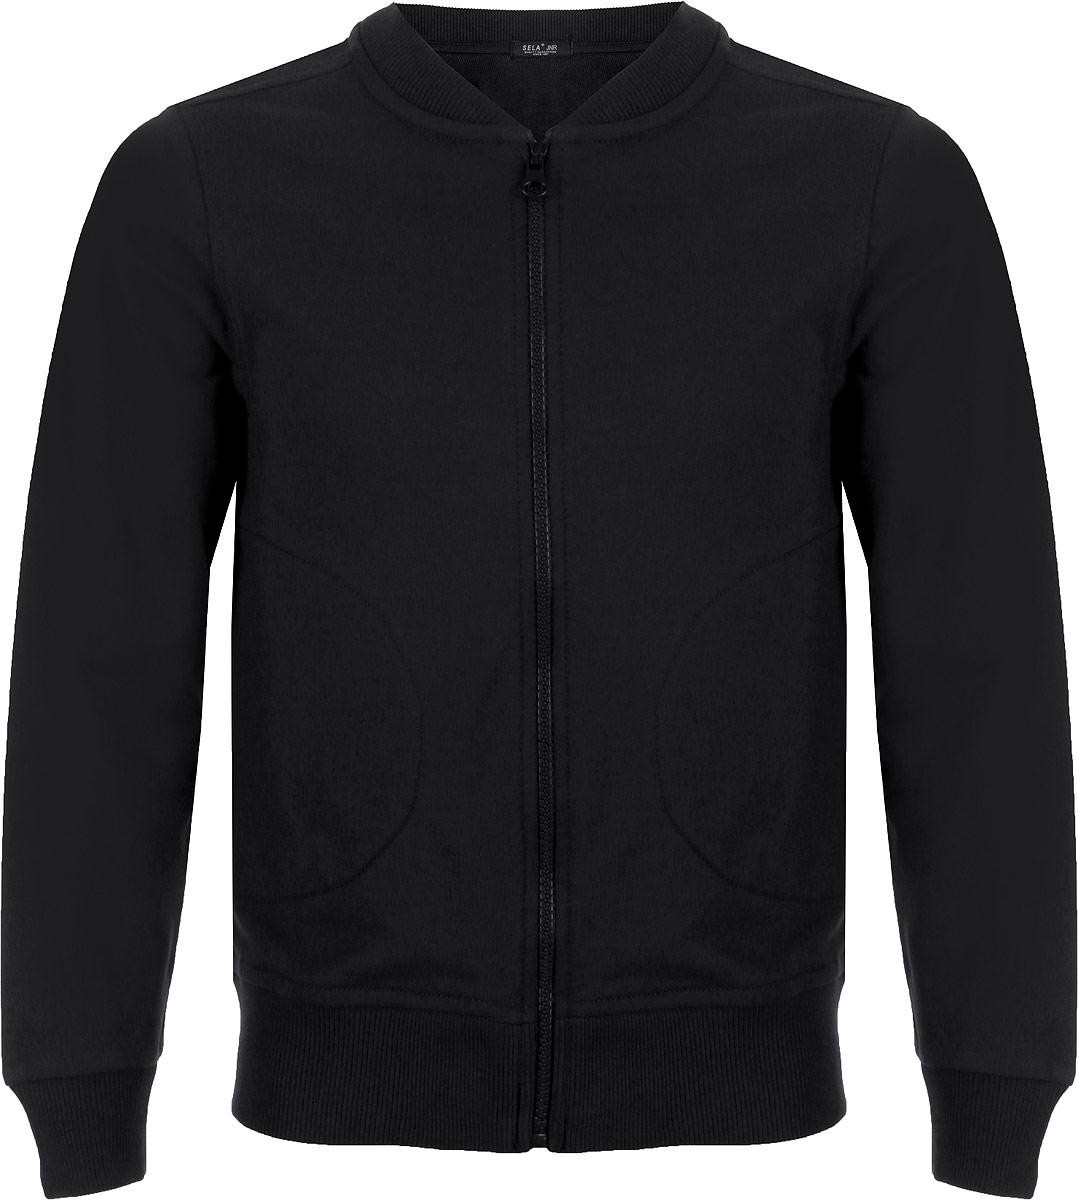 цены Куртка для мальчика Sela, цвет: черный. Stc-813/182-8320. Размер 170